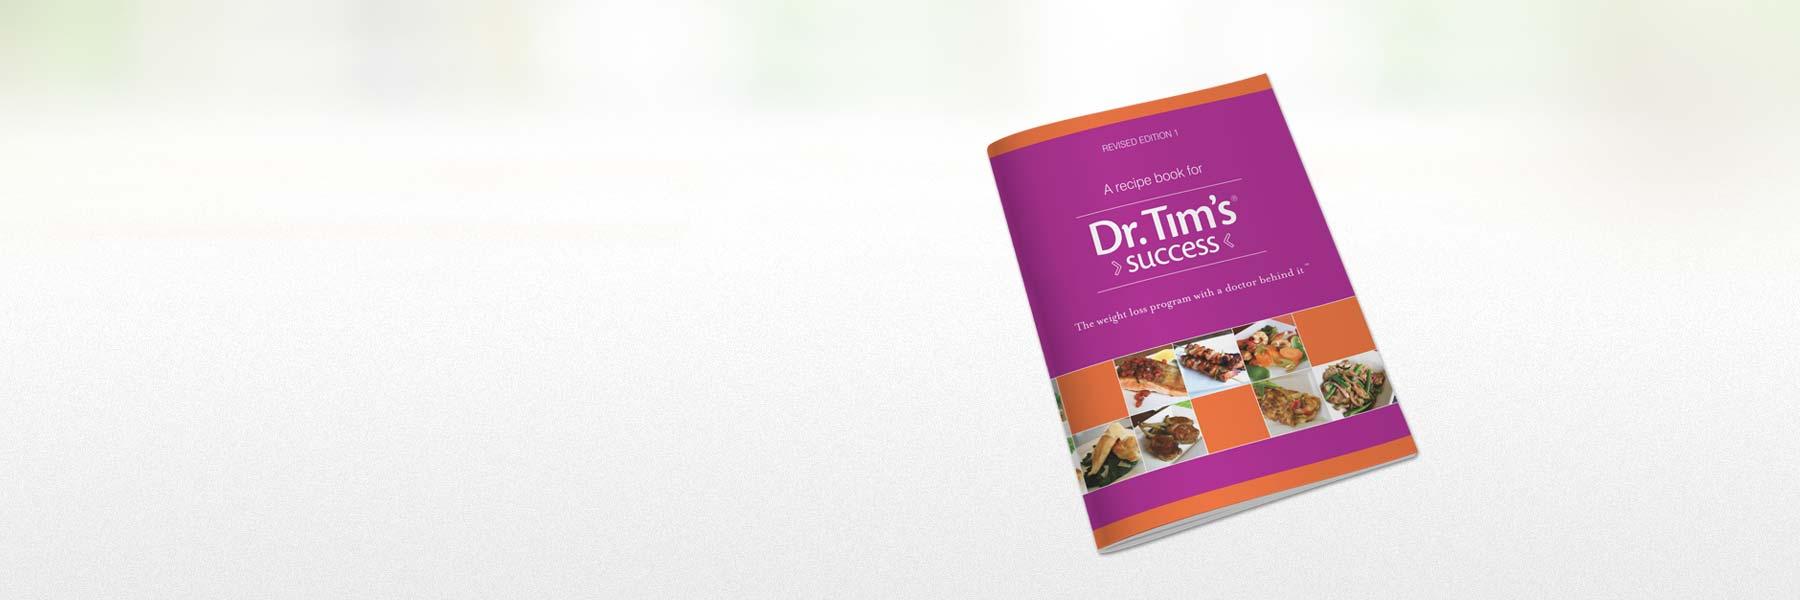 DrTims-Recipe-Book-Edition-1-hero